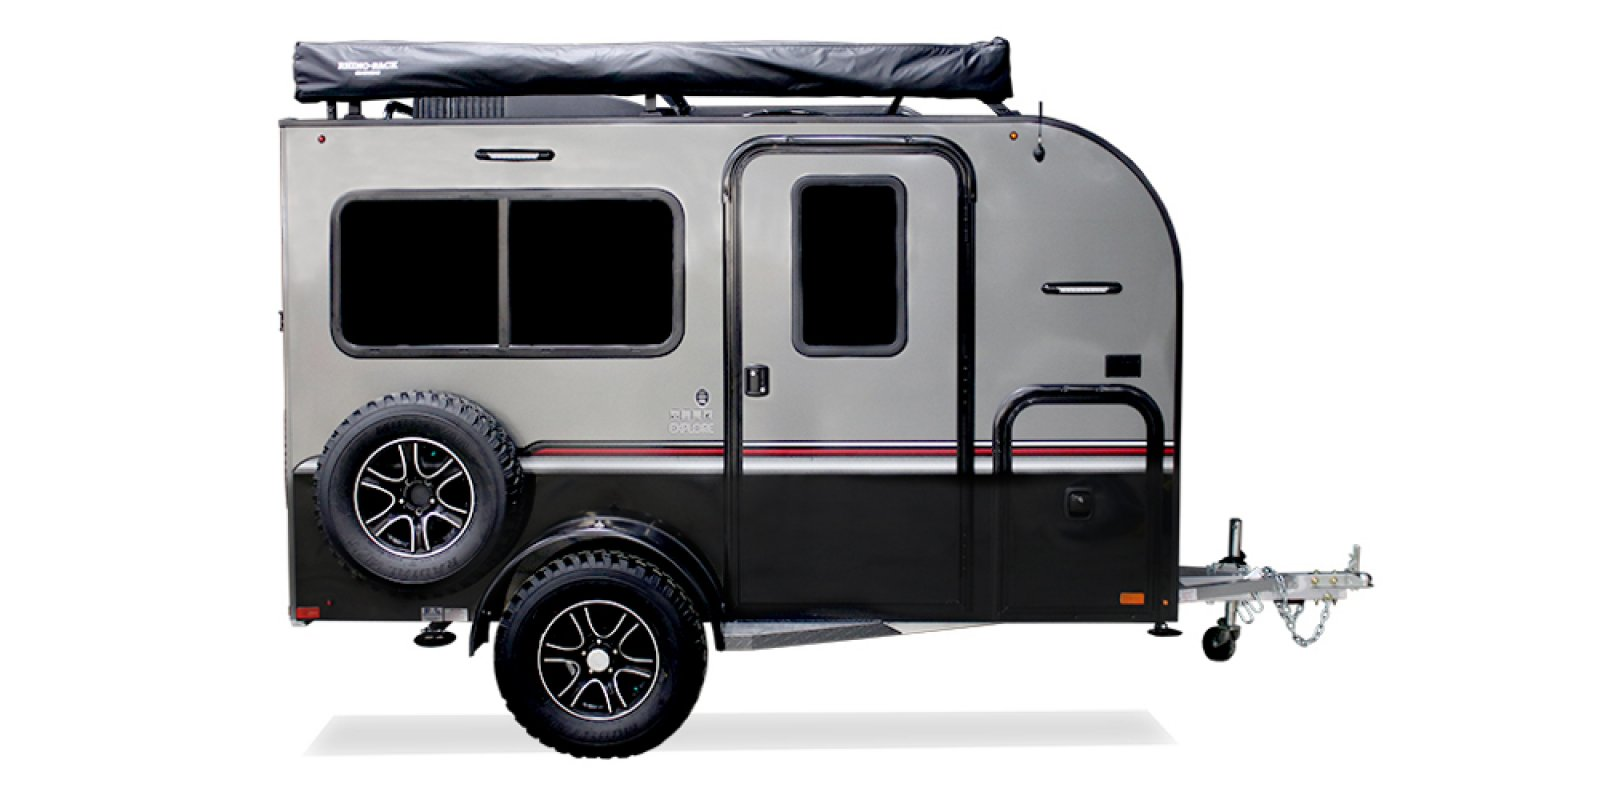 When Size Matters inTech Flyer Camper Window Decal